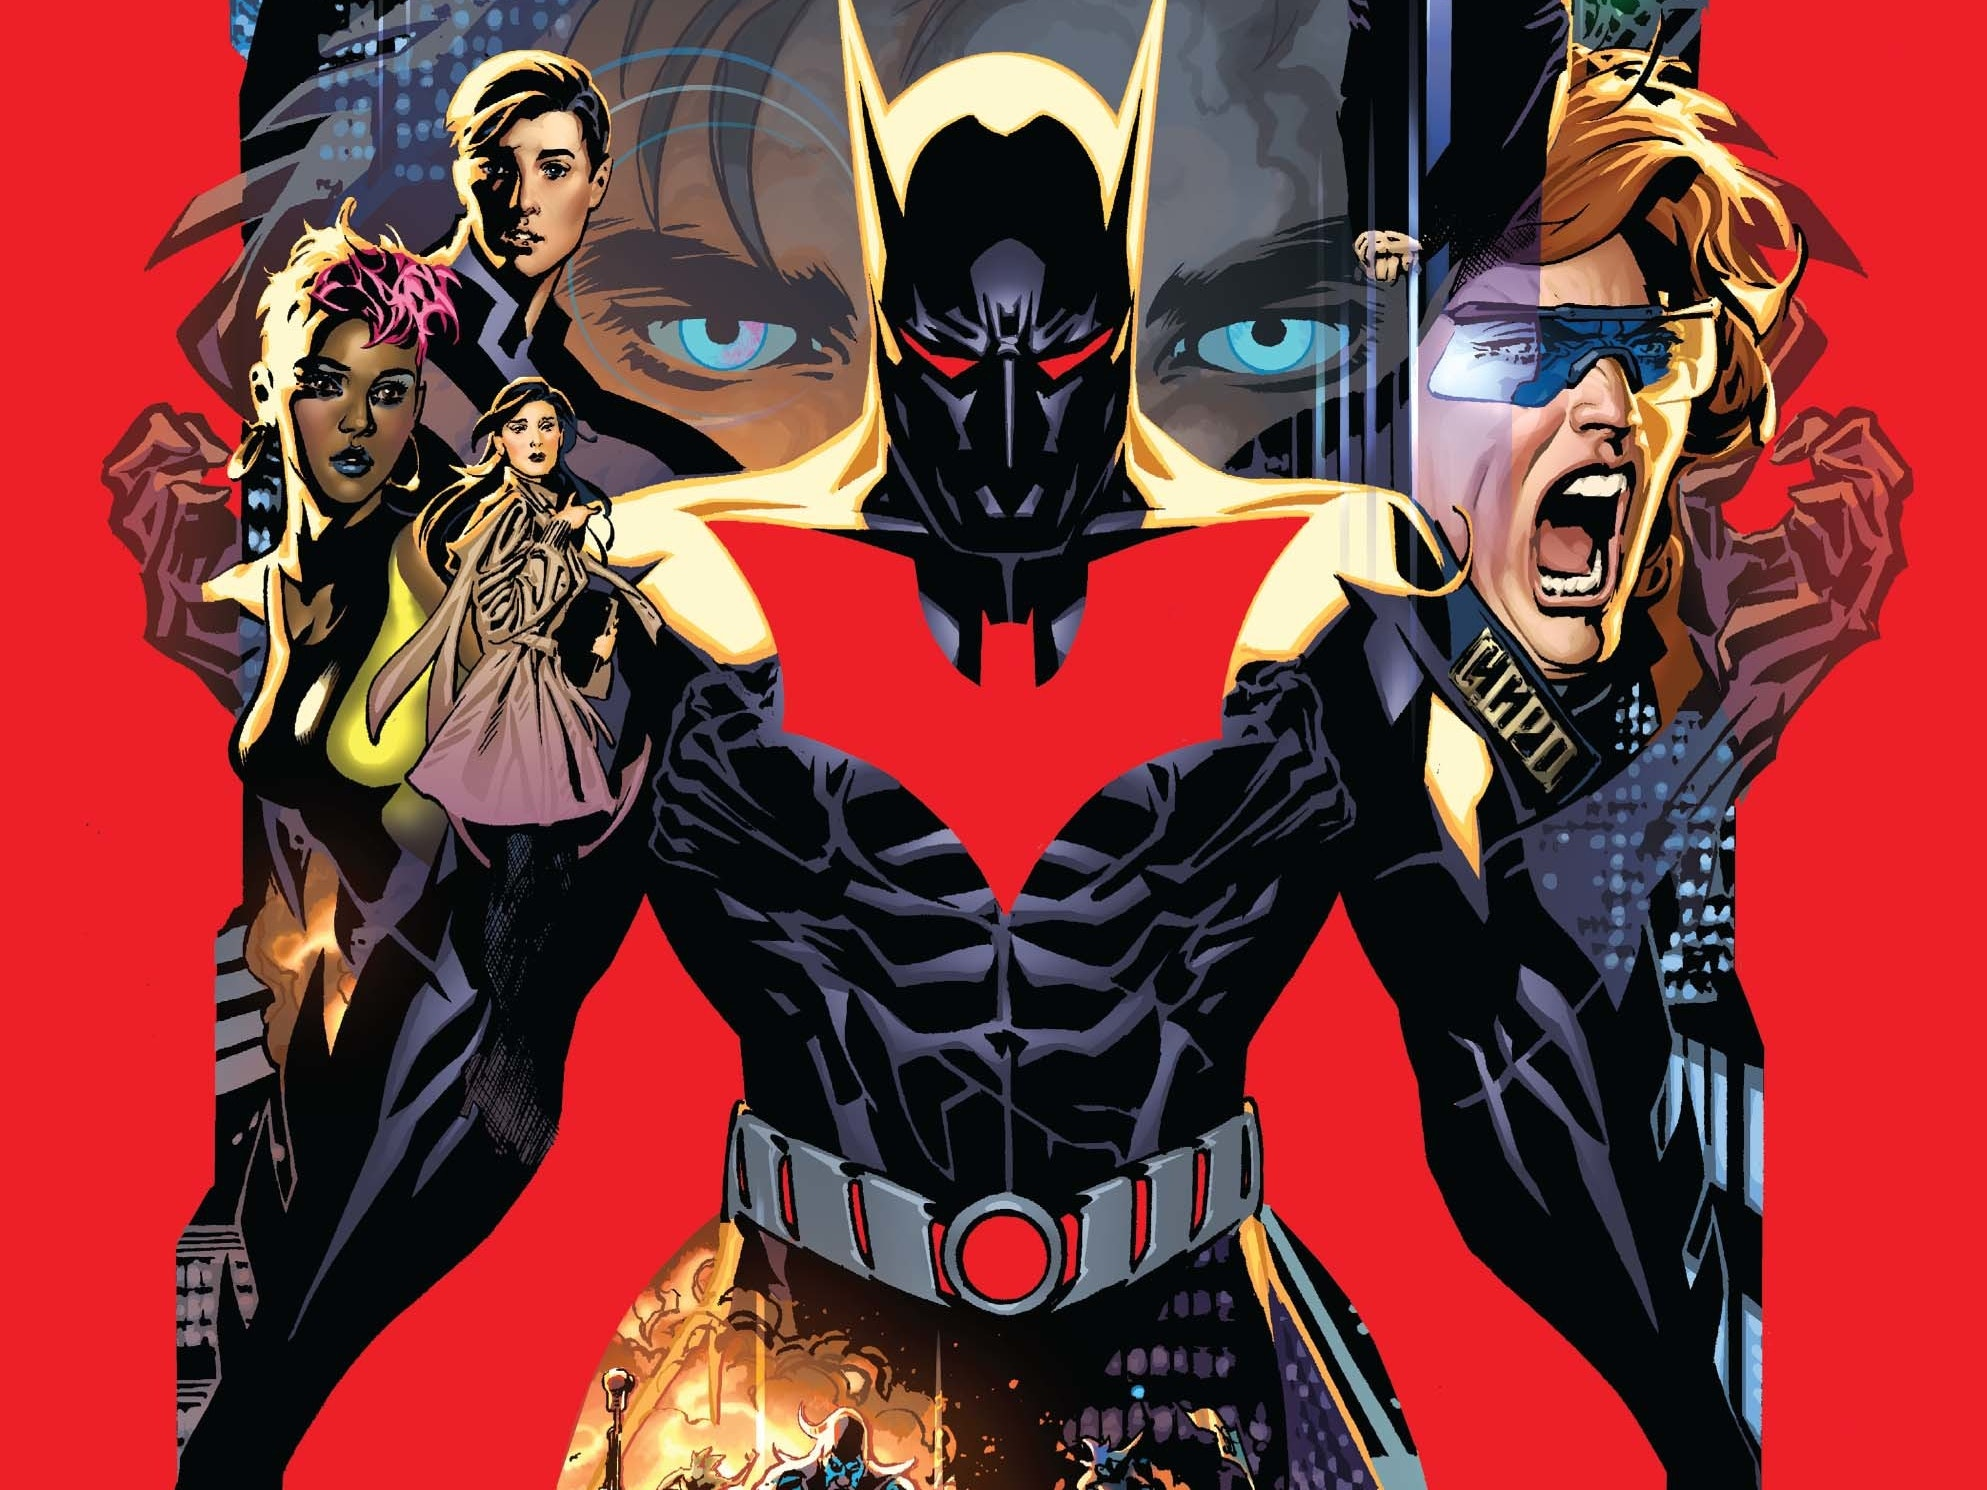 Terry Joins the Jokerz In 'Batman Beyond' Rebirth Comic